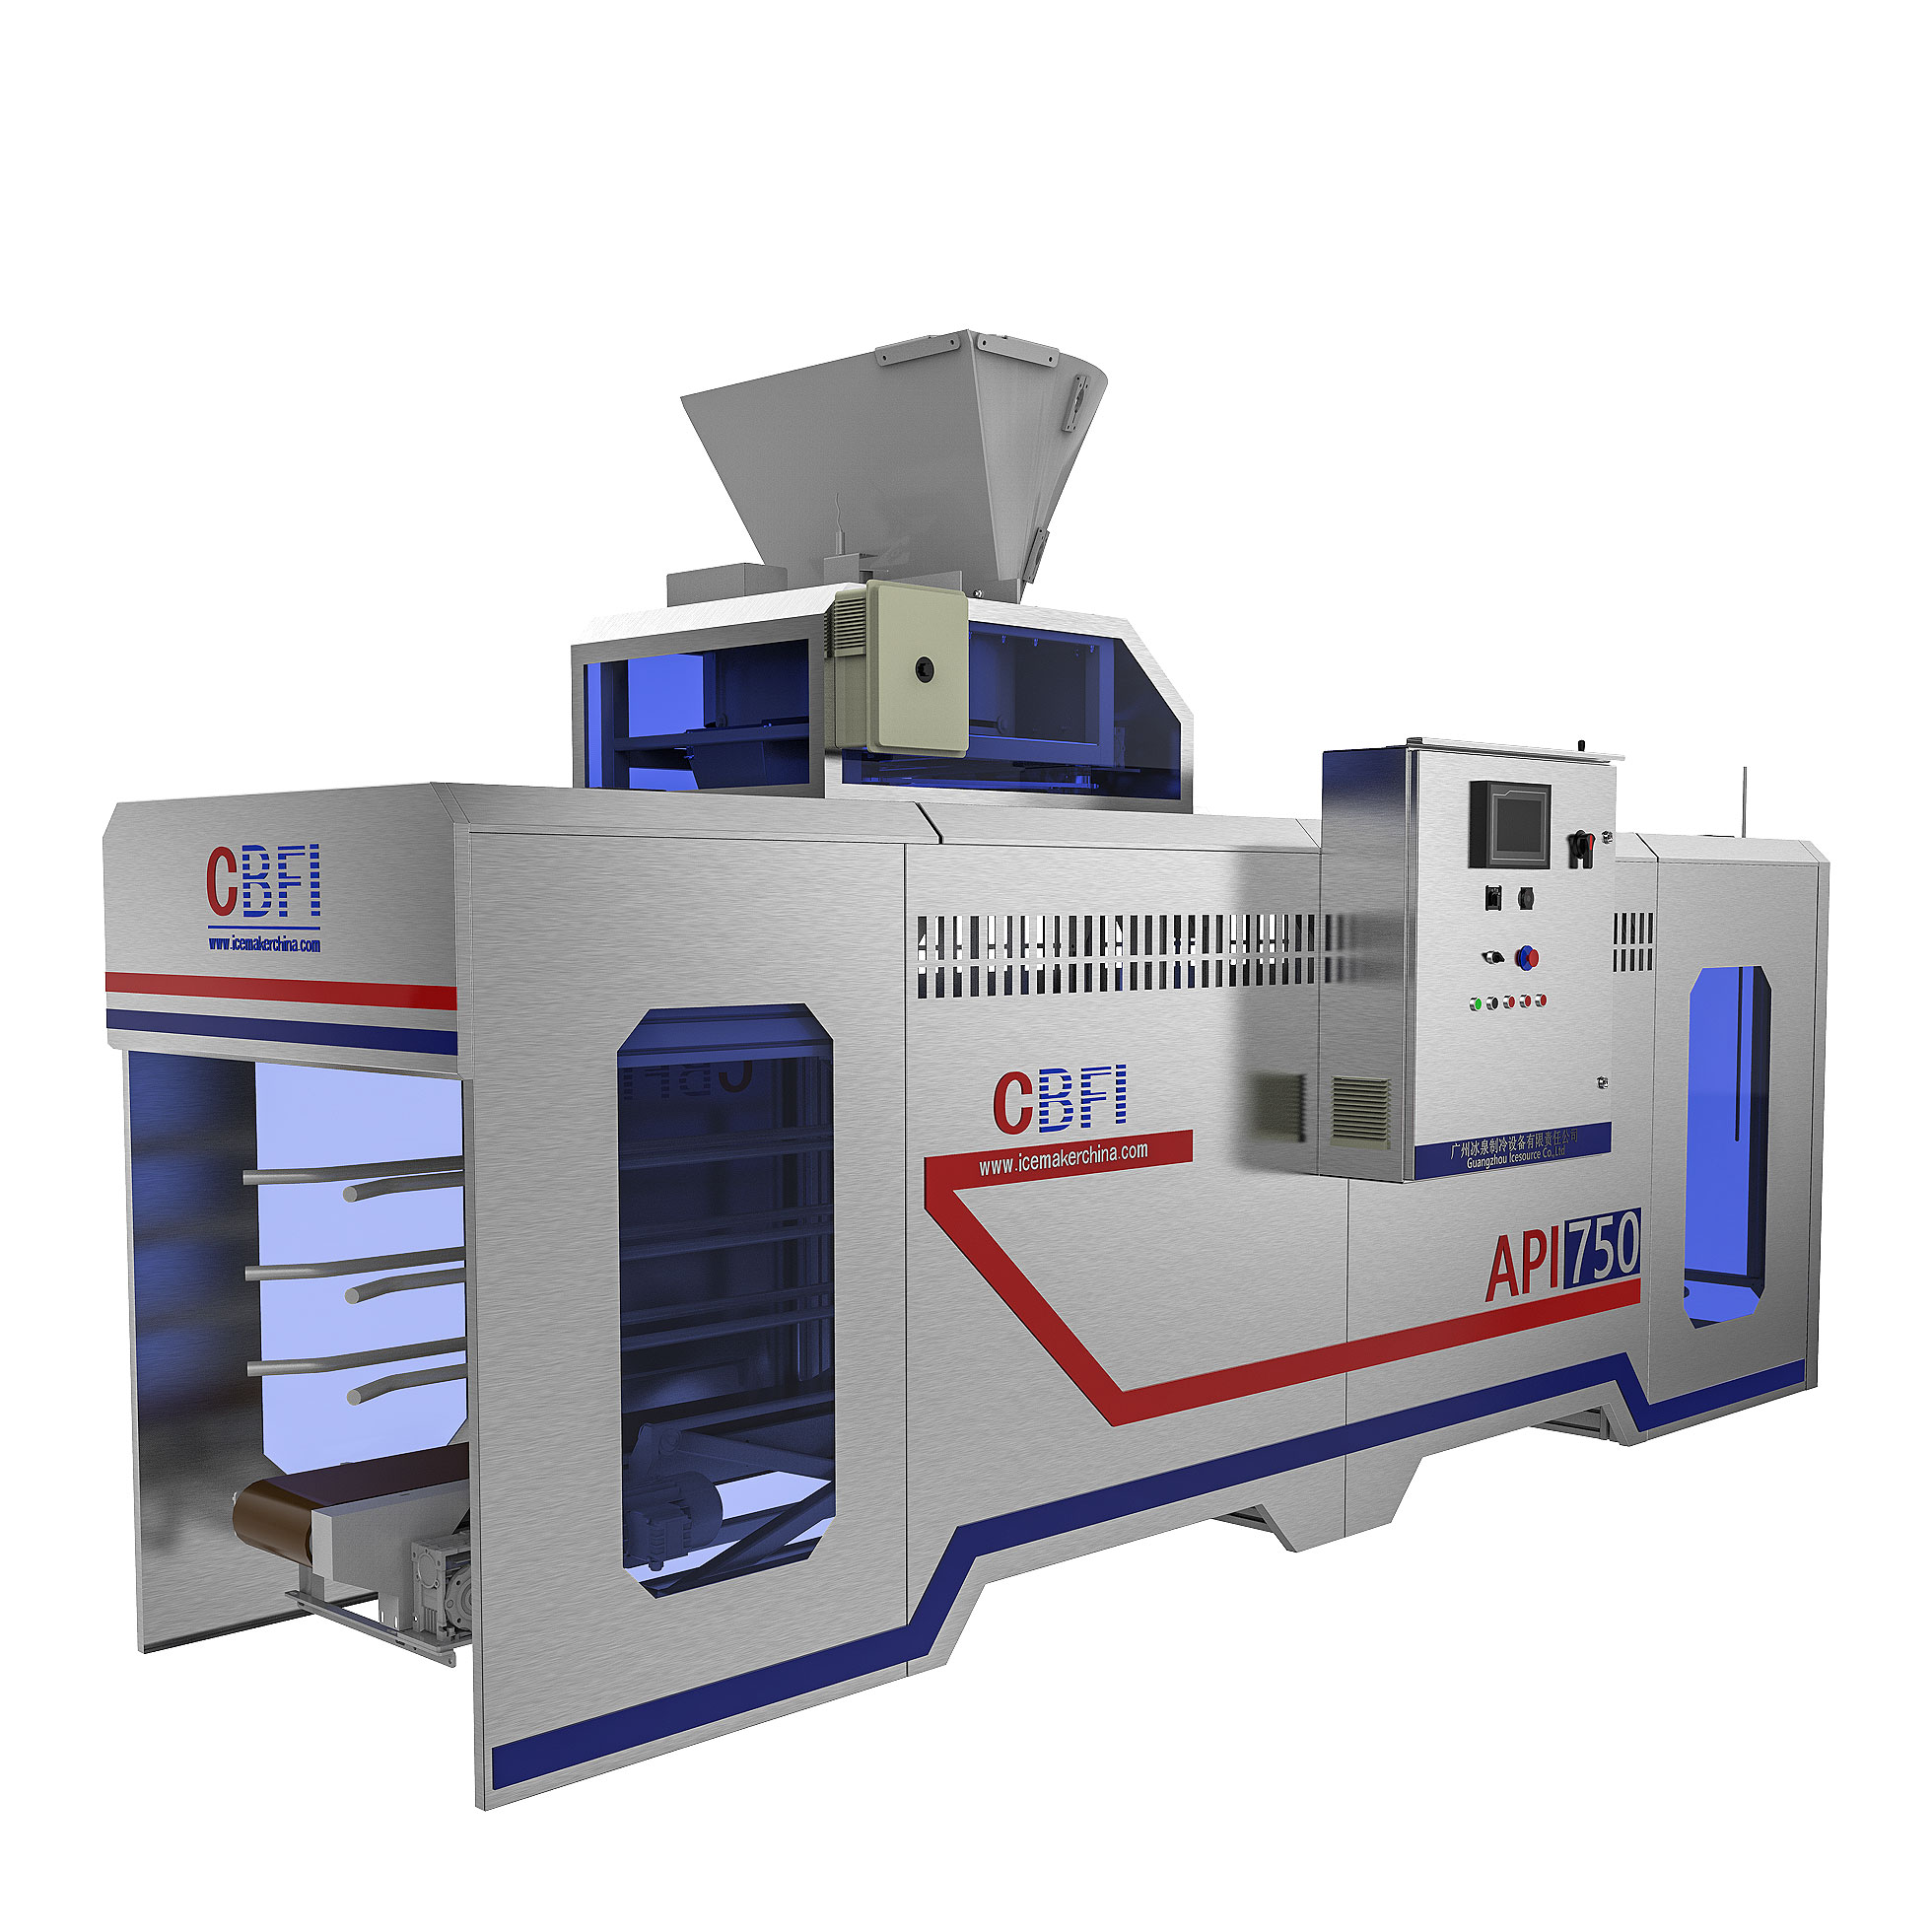 CBFI-Large Cube Ice Maker | Cbfi Cv10000 10 Tons Per Day Cube Ice Maker With-7